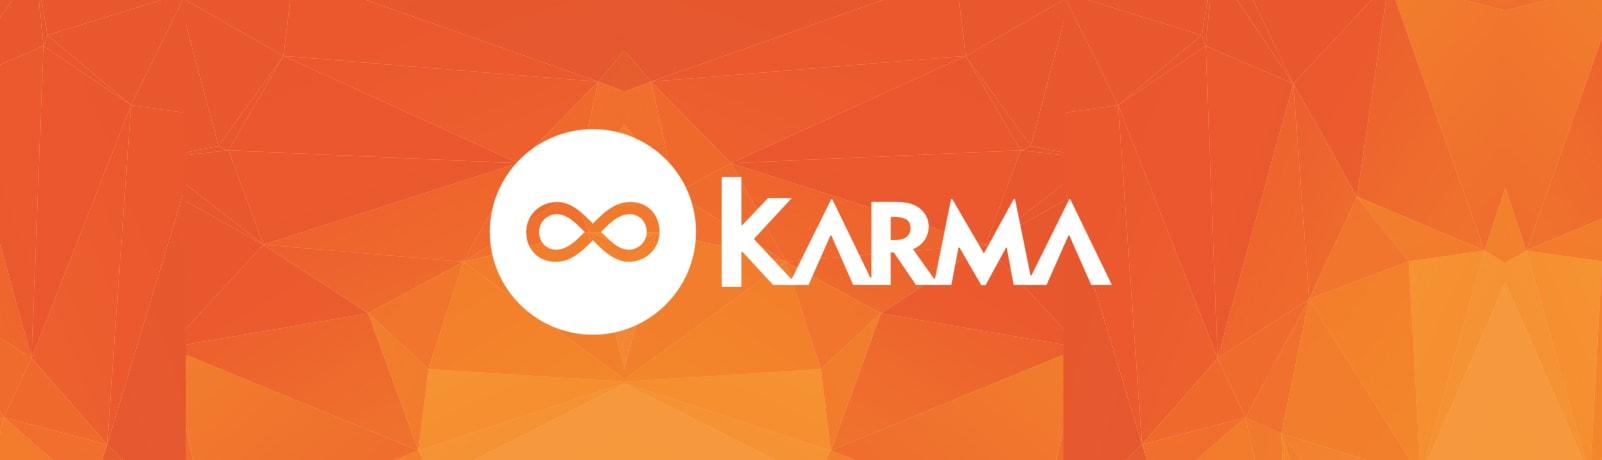 Karmanote